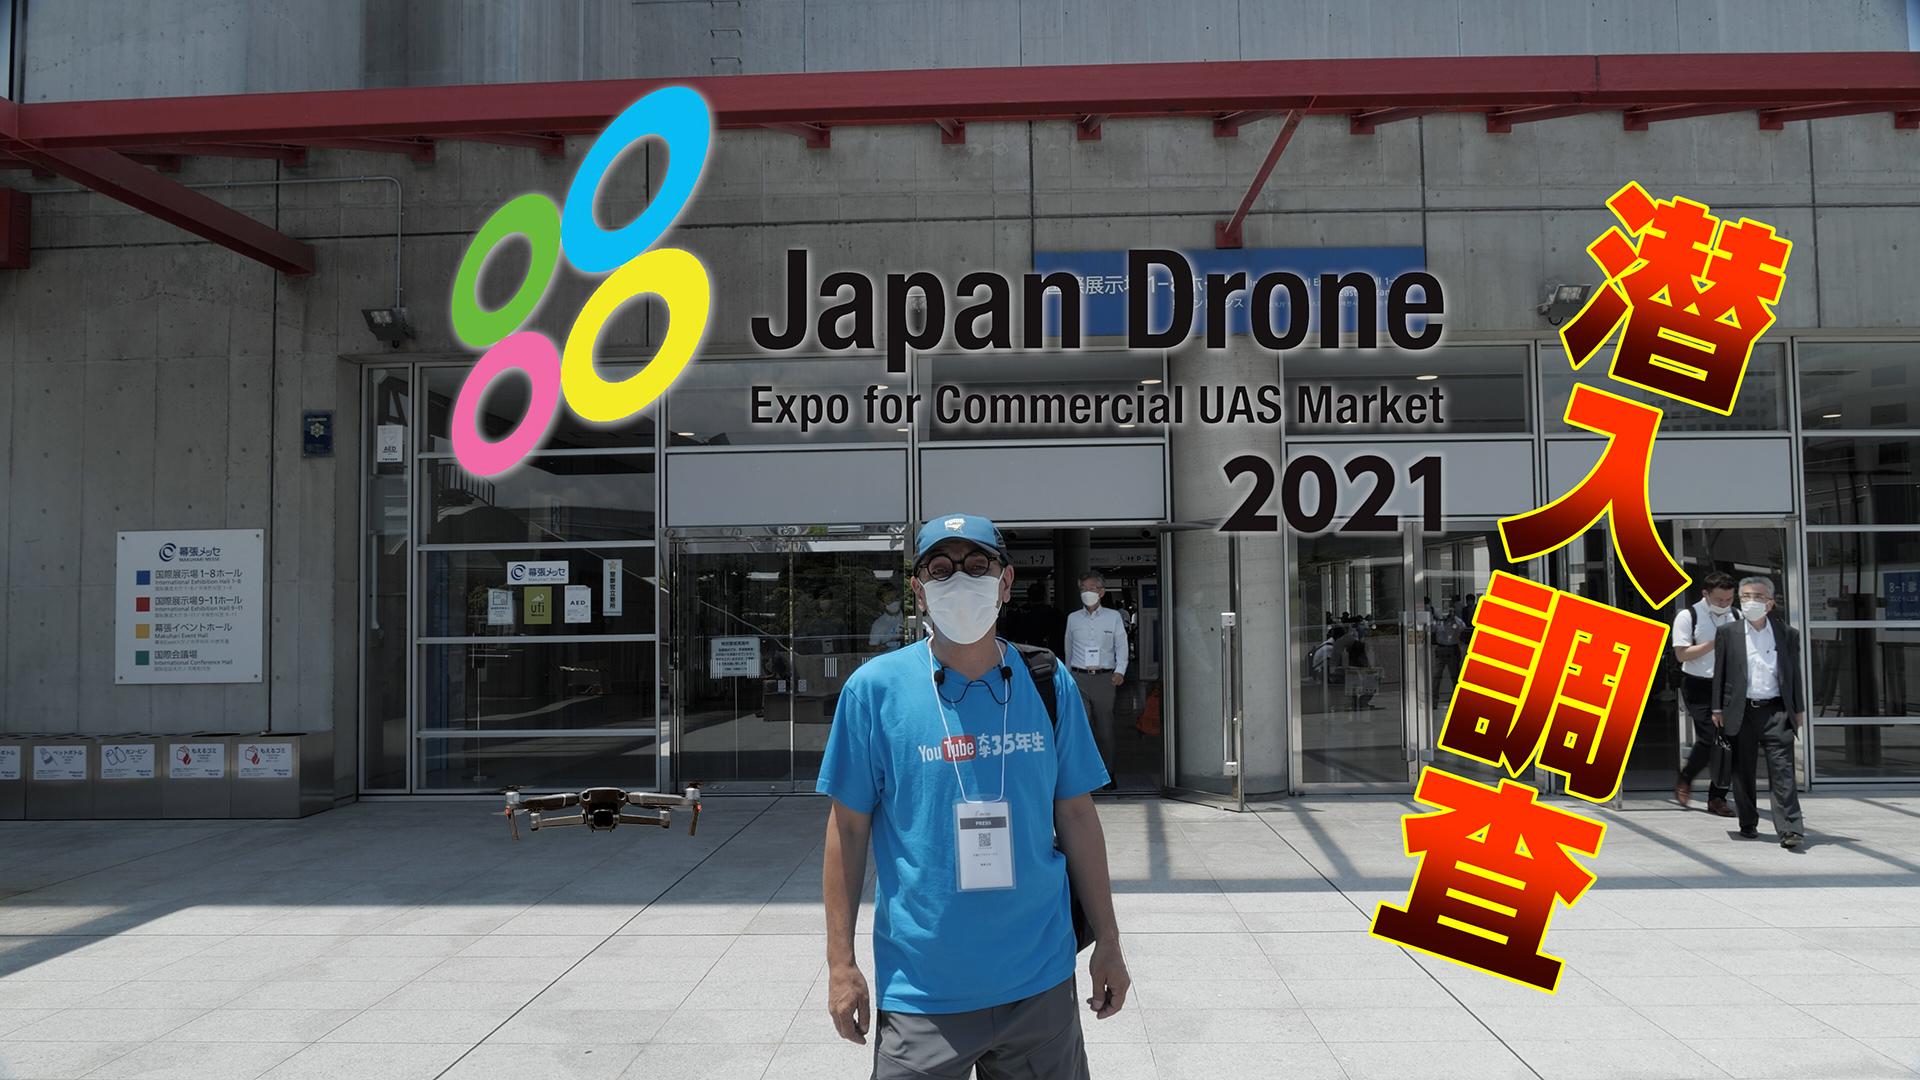 Japan Drone 2021(ジャパンドローン2021)にプレス(Youtuber)として潜入調査したら会場の熱気が凄かった!